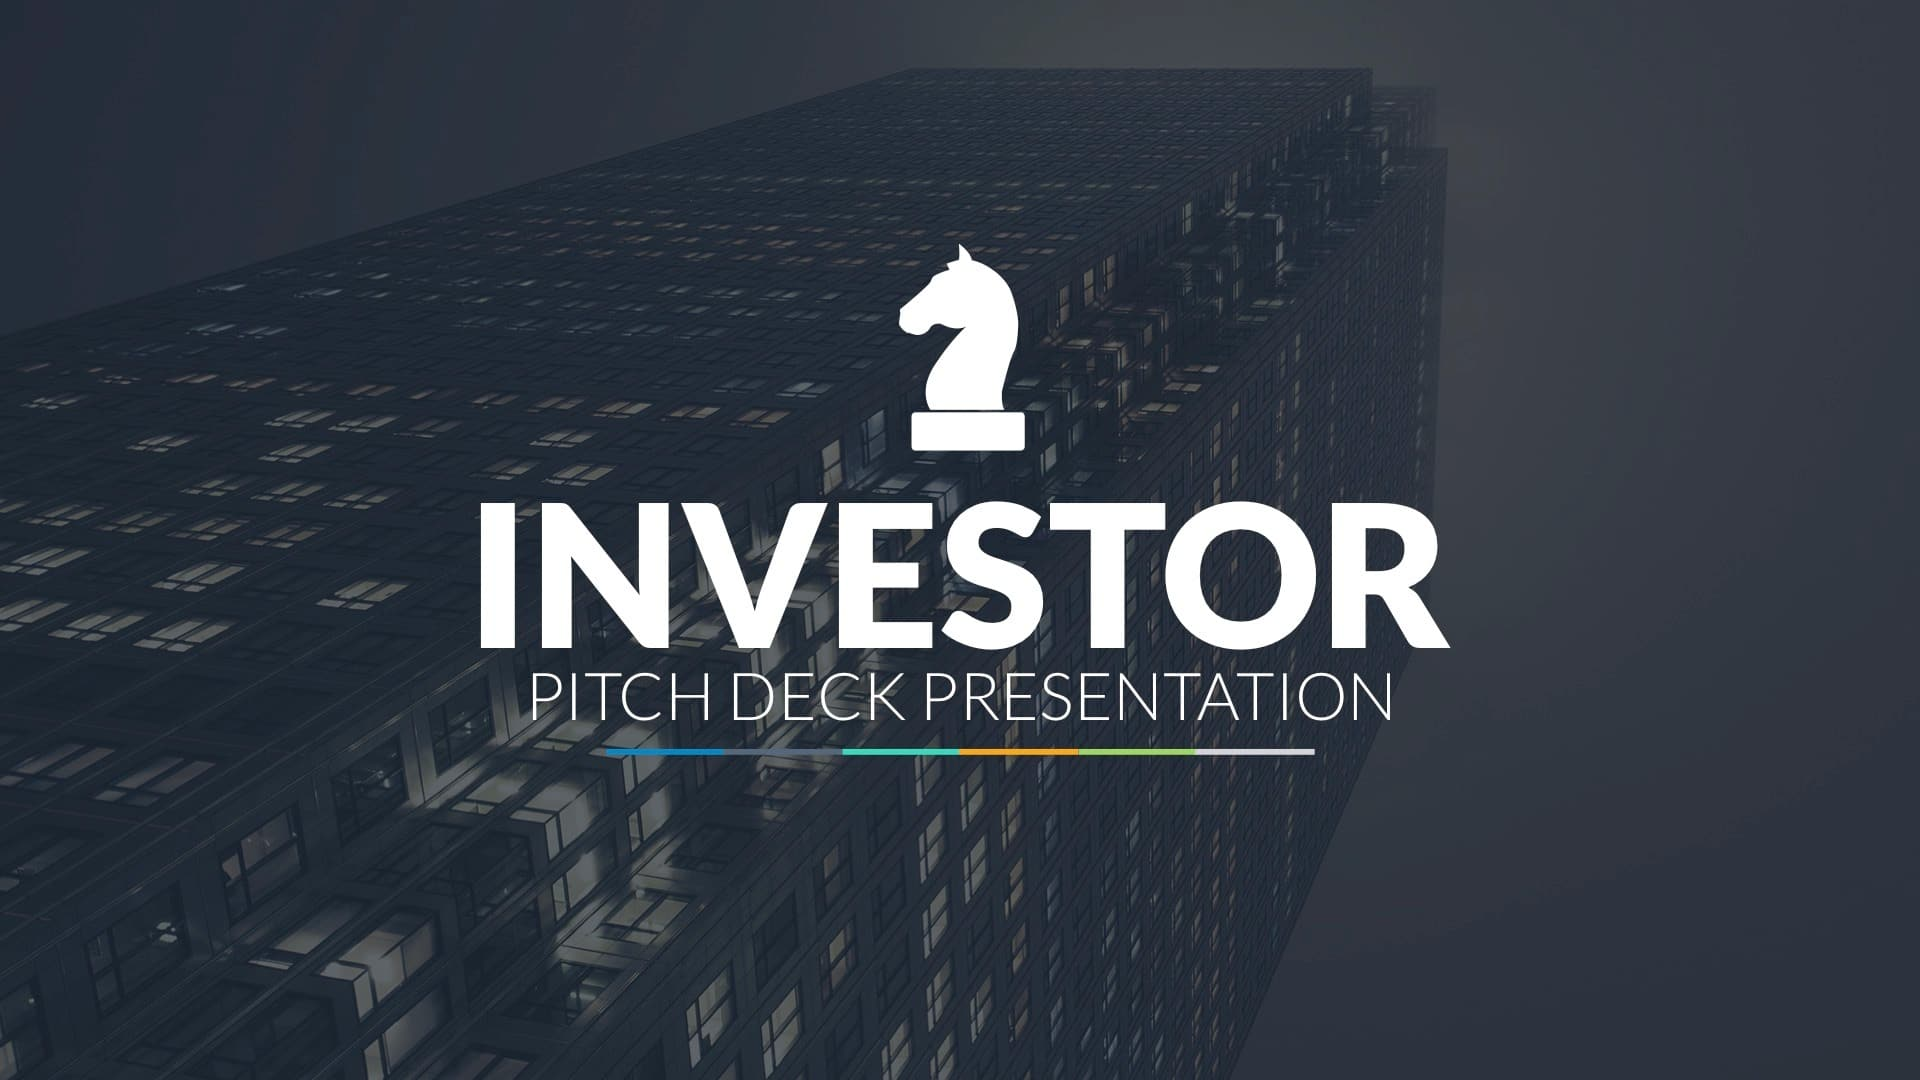 Plantilla de Powerpoint ideal para buscar inversores